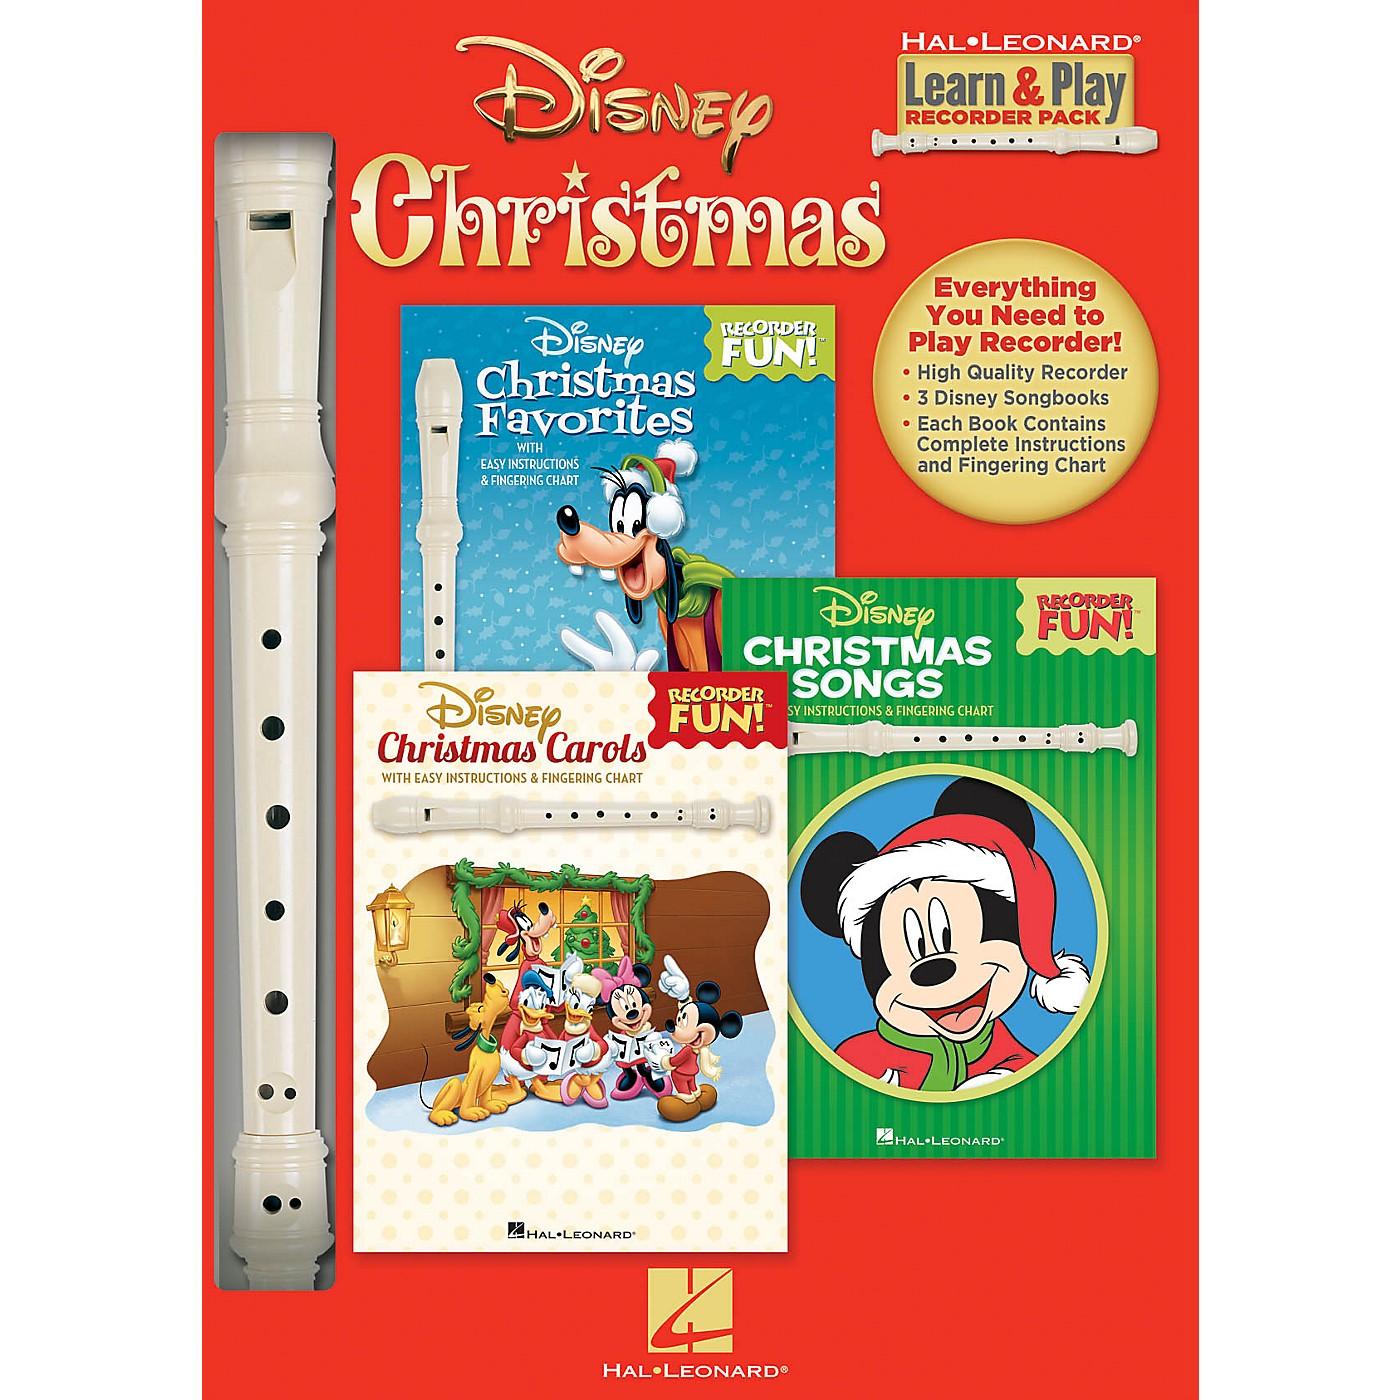 Hal Leonard Disney Christmas (Learn & Play Recorder Pack) Recorder Series General Merchandise thumbnail